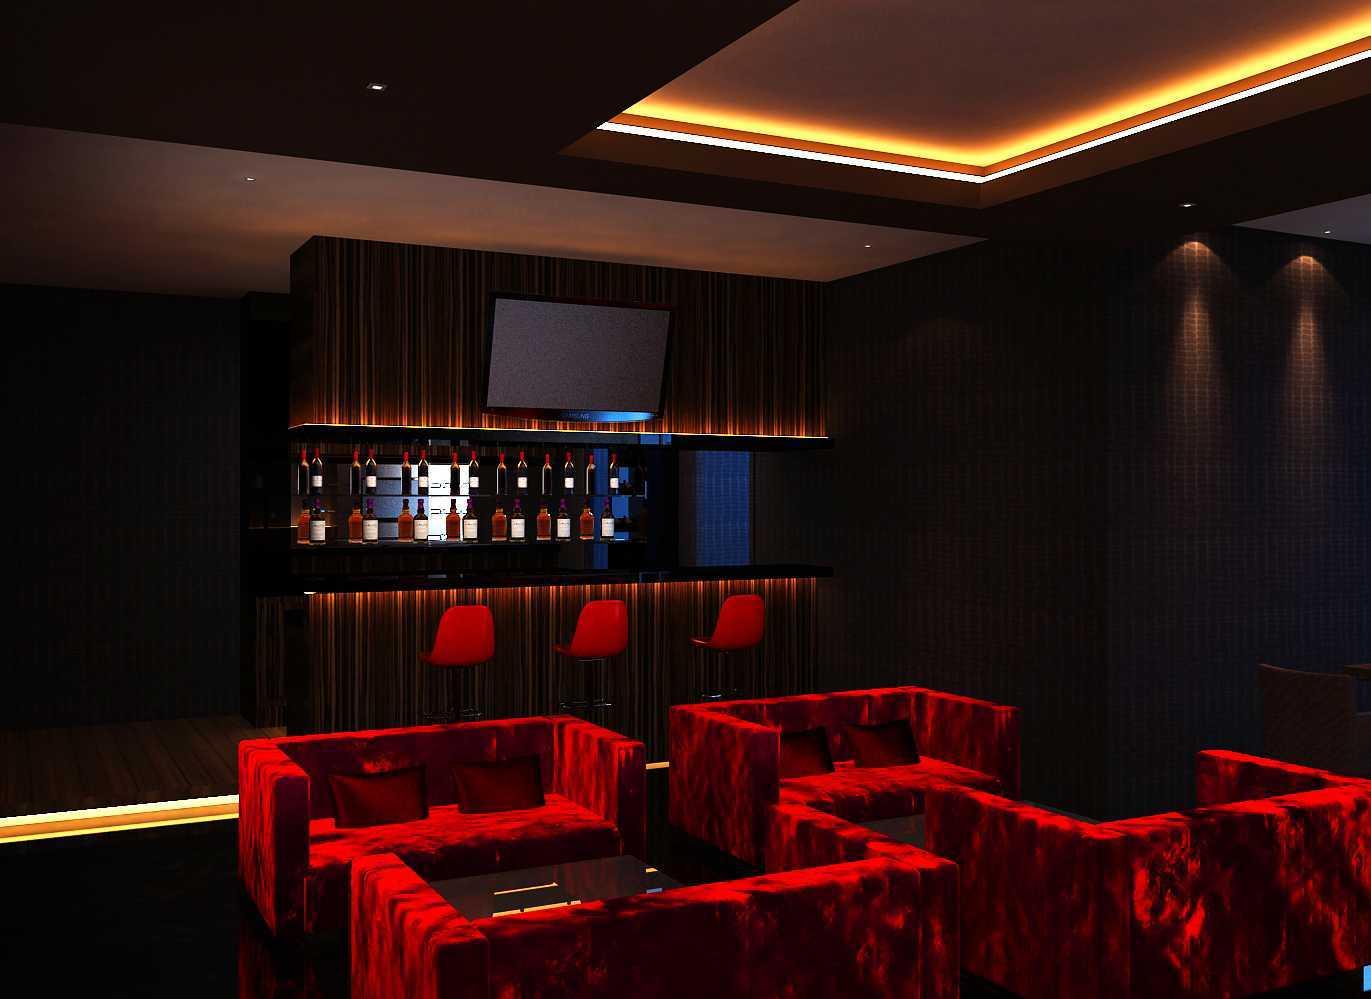 Donny Steven Massie The Wine Lounge Sudirman - Jakarta Sudirman - Jakarta Seating Area Modern 23471